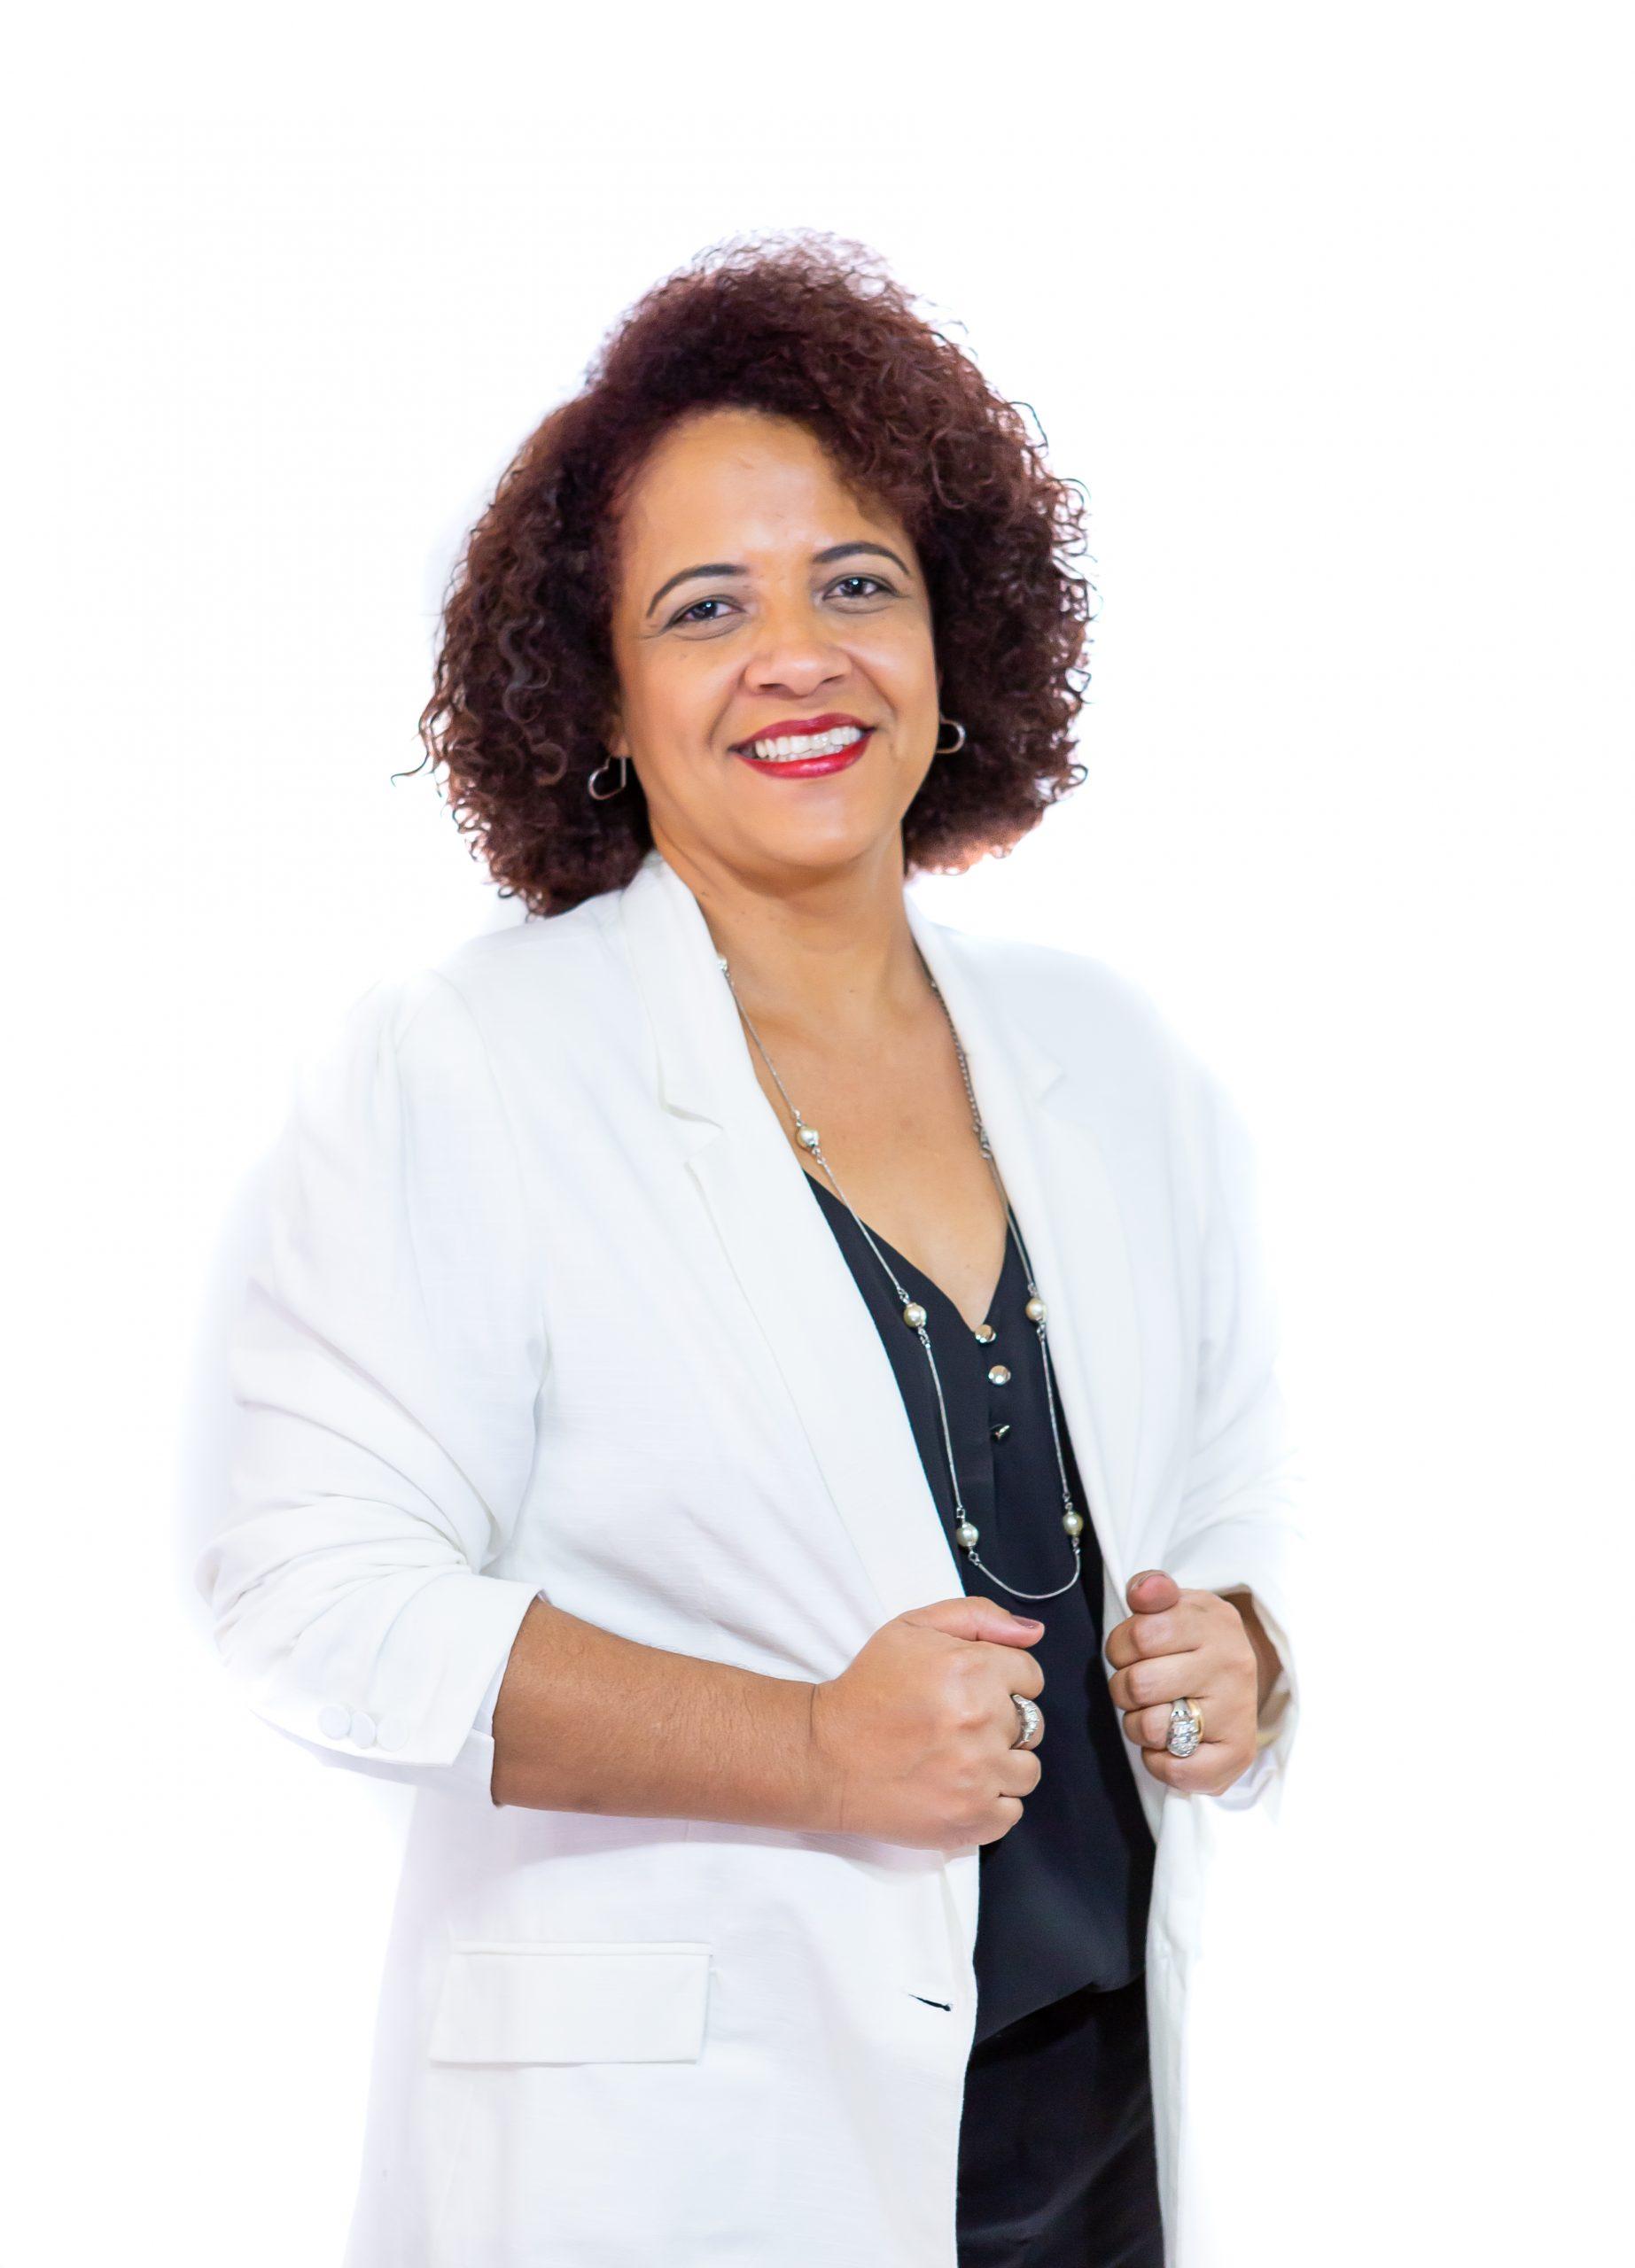 Simone S. Santos